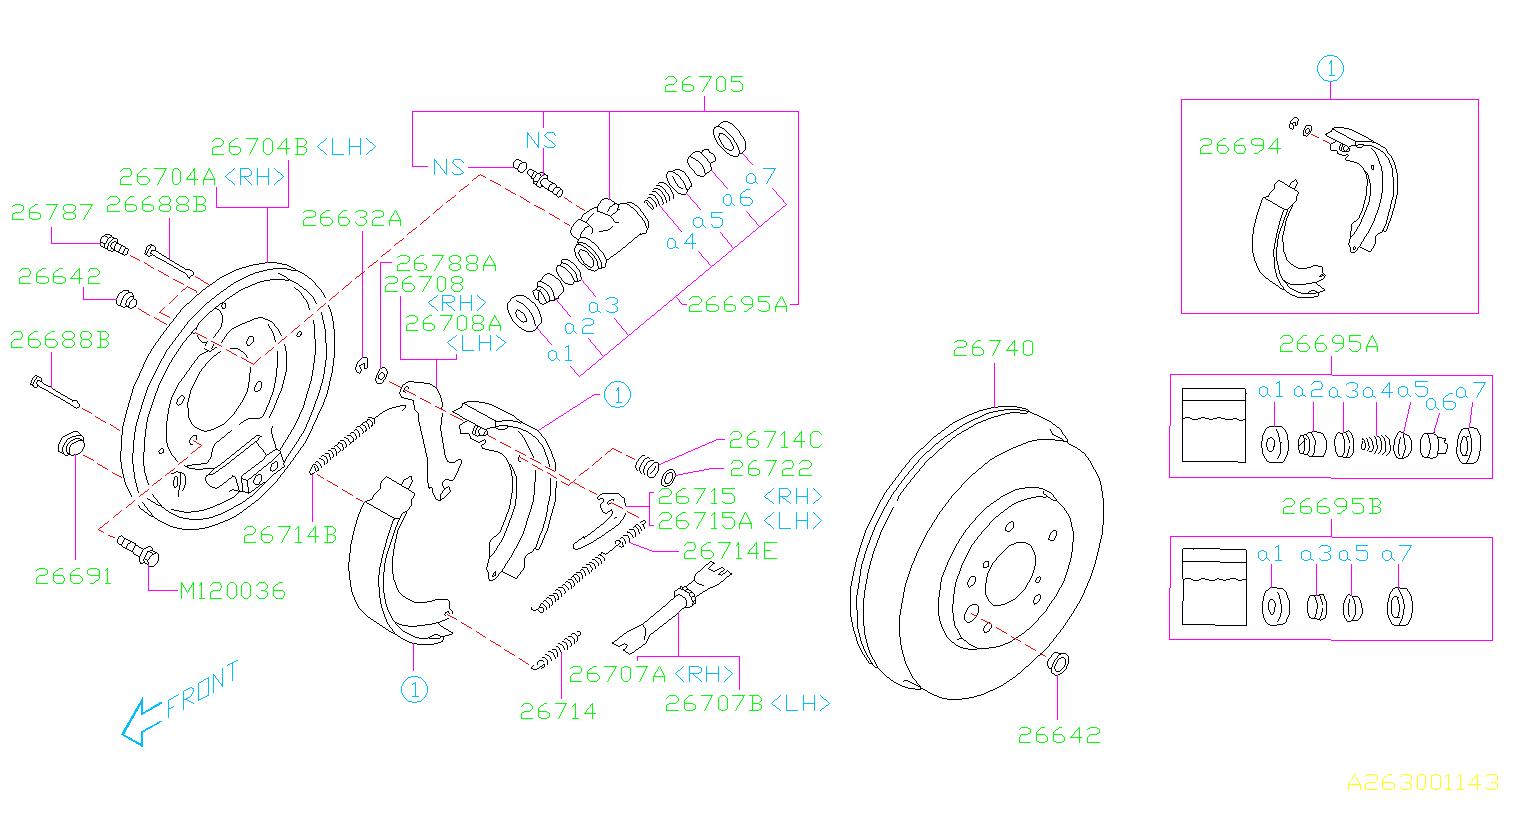 26704ae040 - Brake Splash Guard  Back Plate Brake   Right  Rear